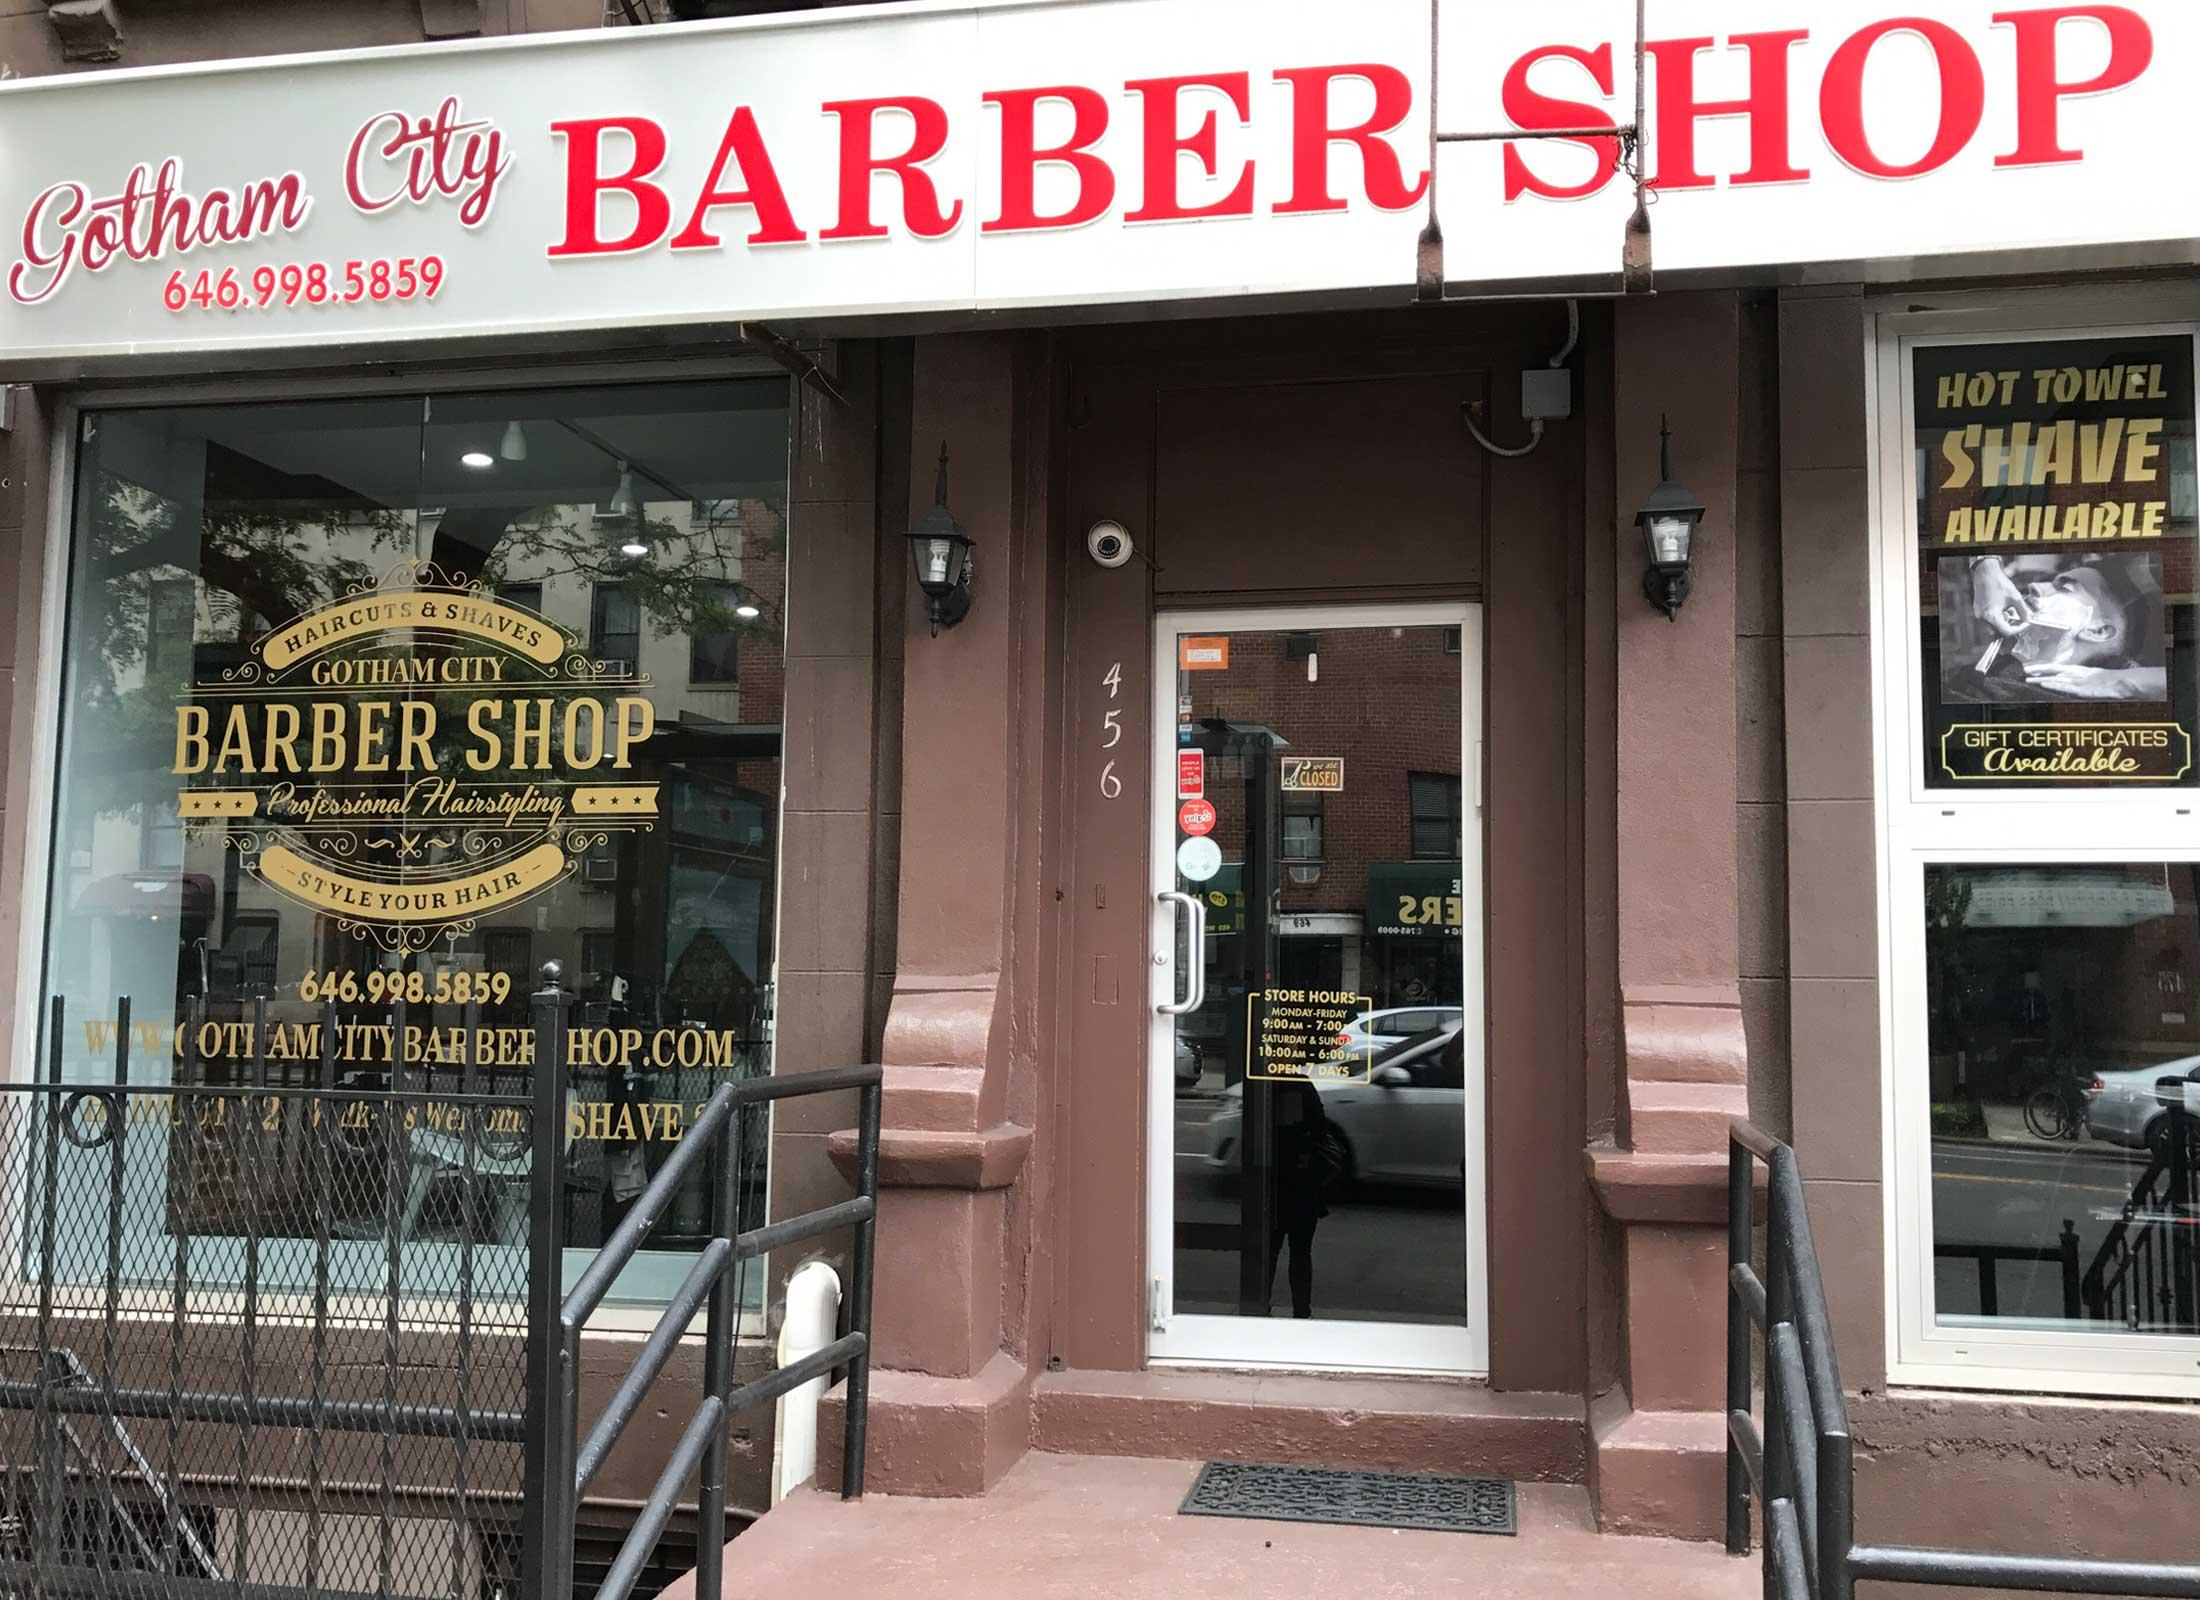 Barbershop, New York, Reise, USA